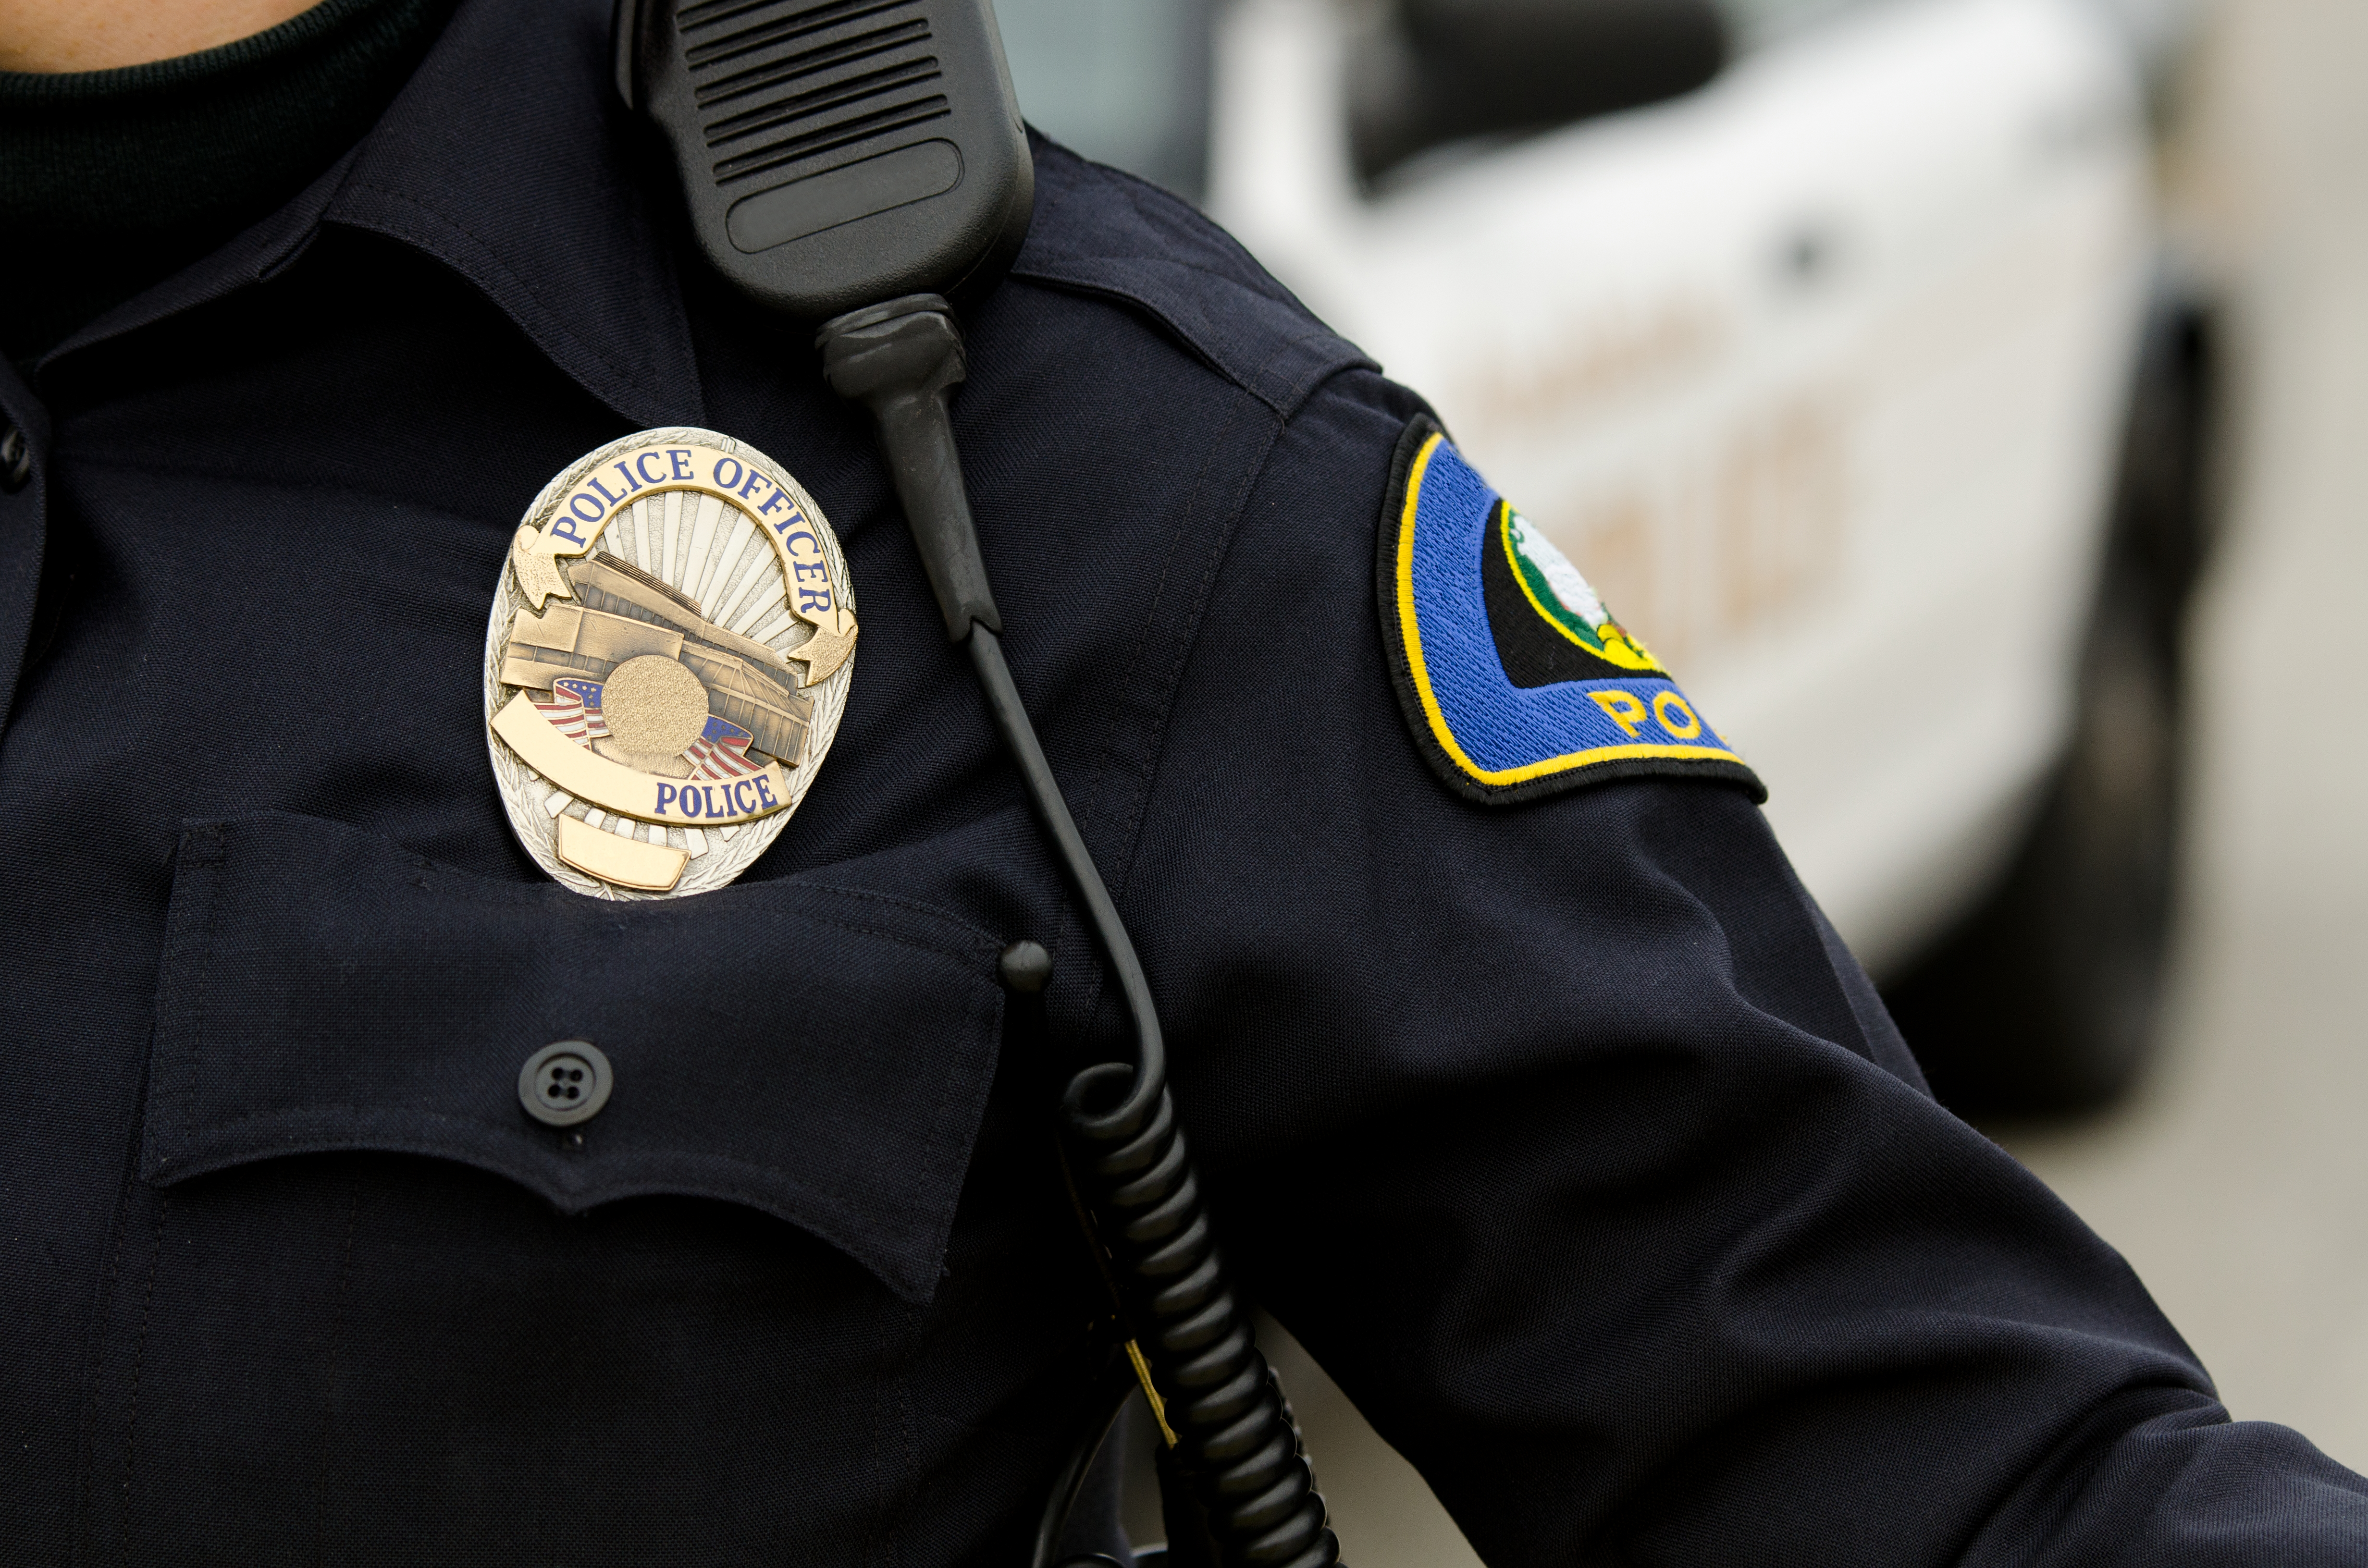 Police officer pulls driver over